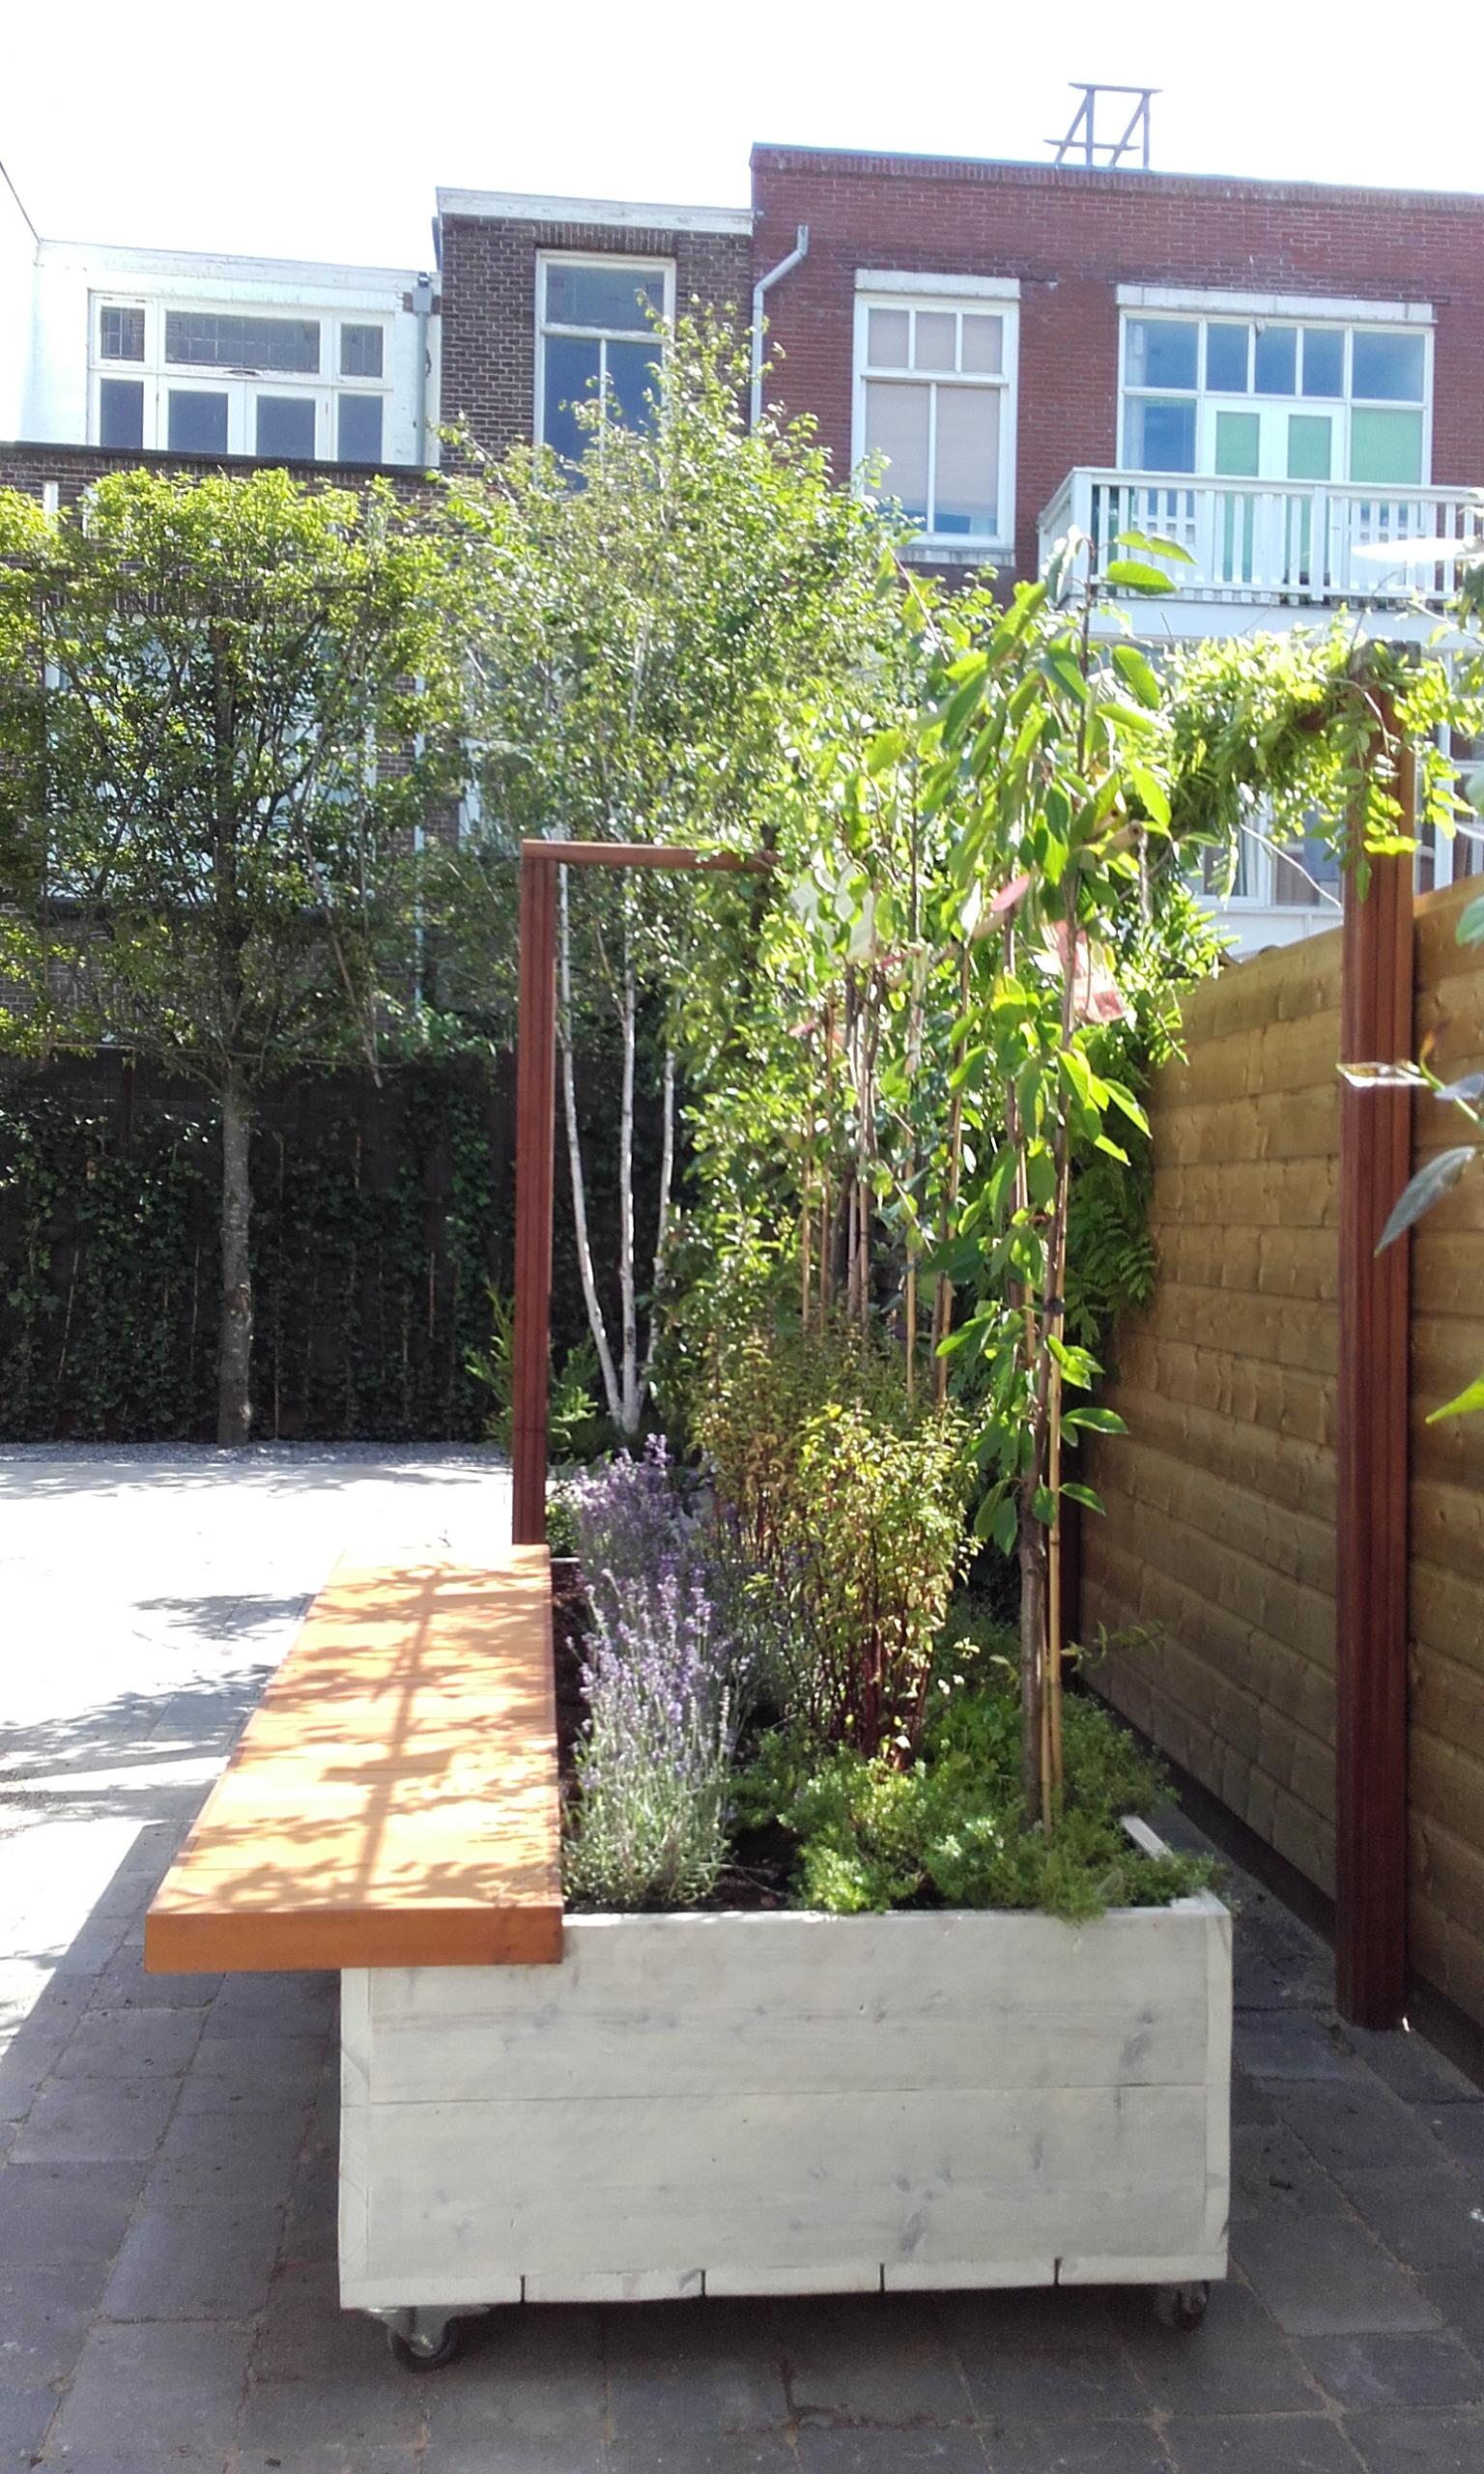 Project stads tuin Den Haag